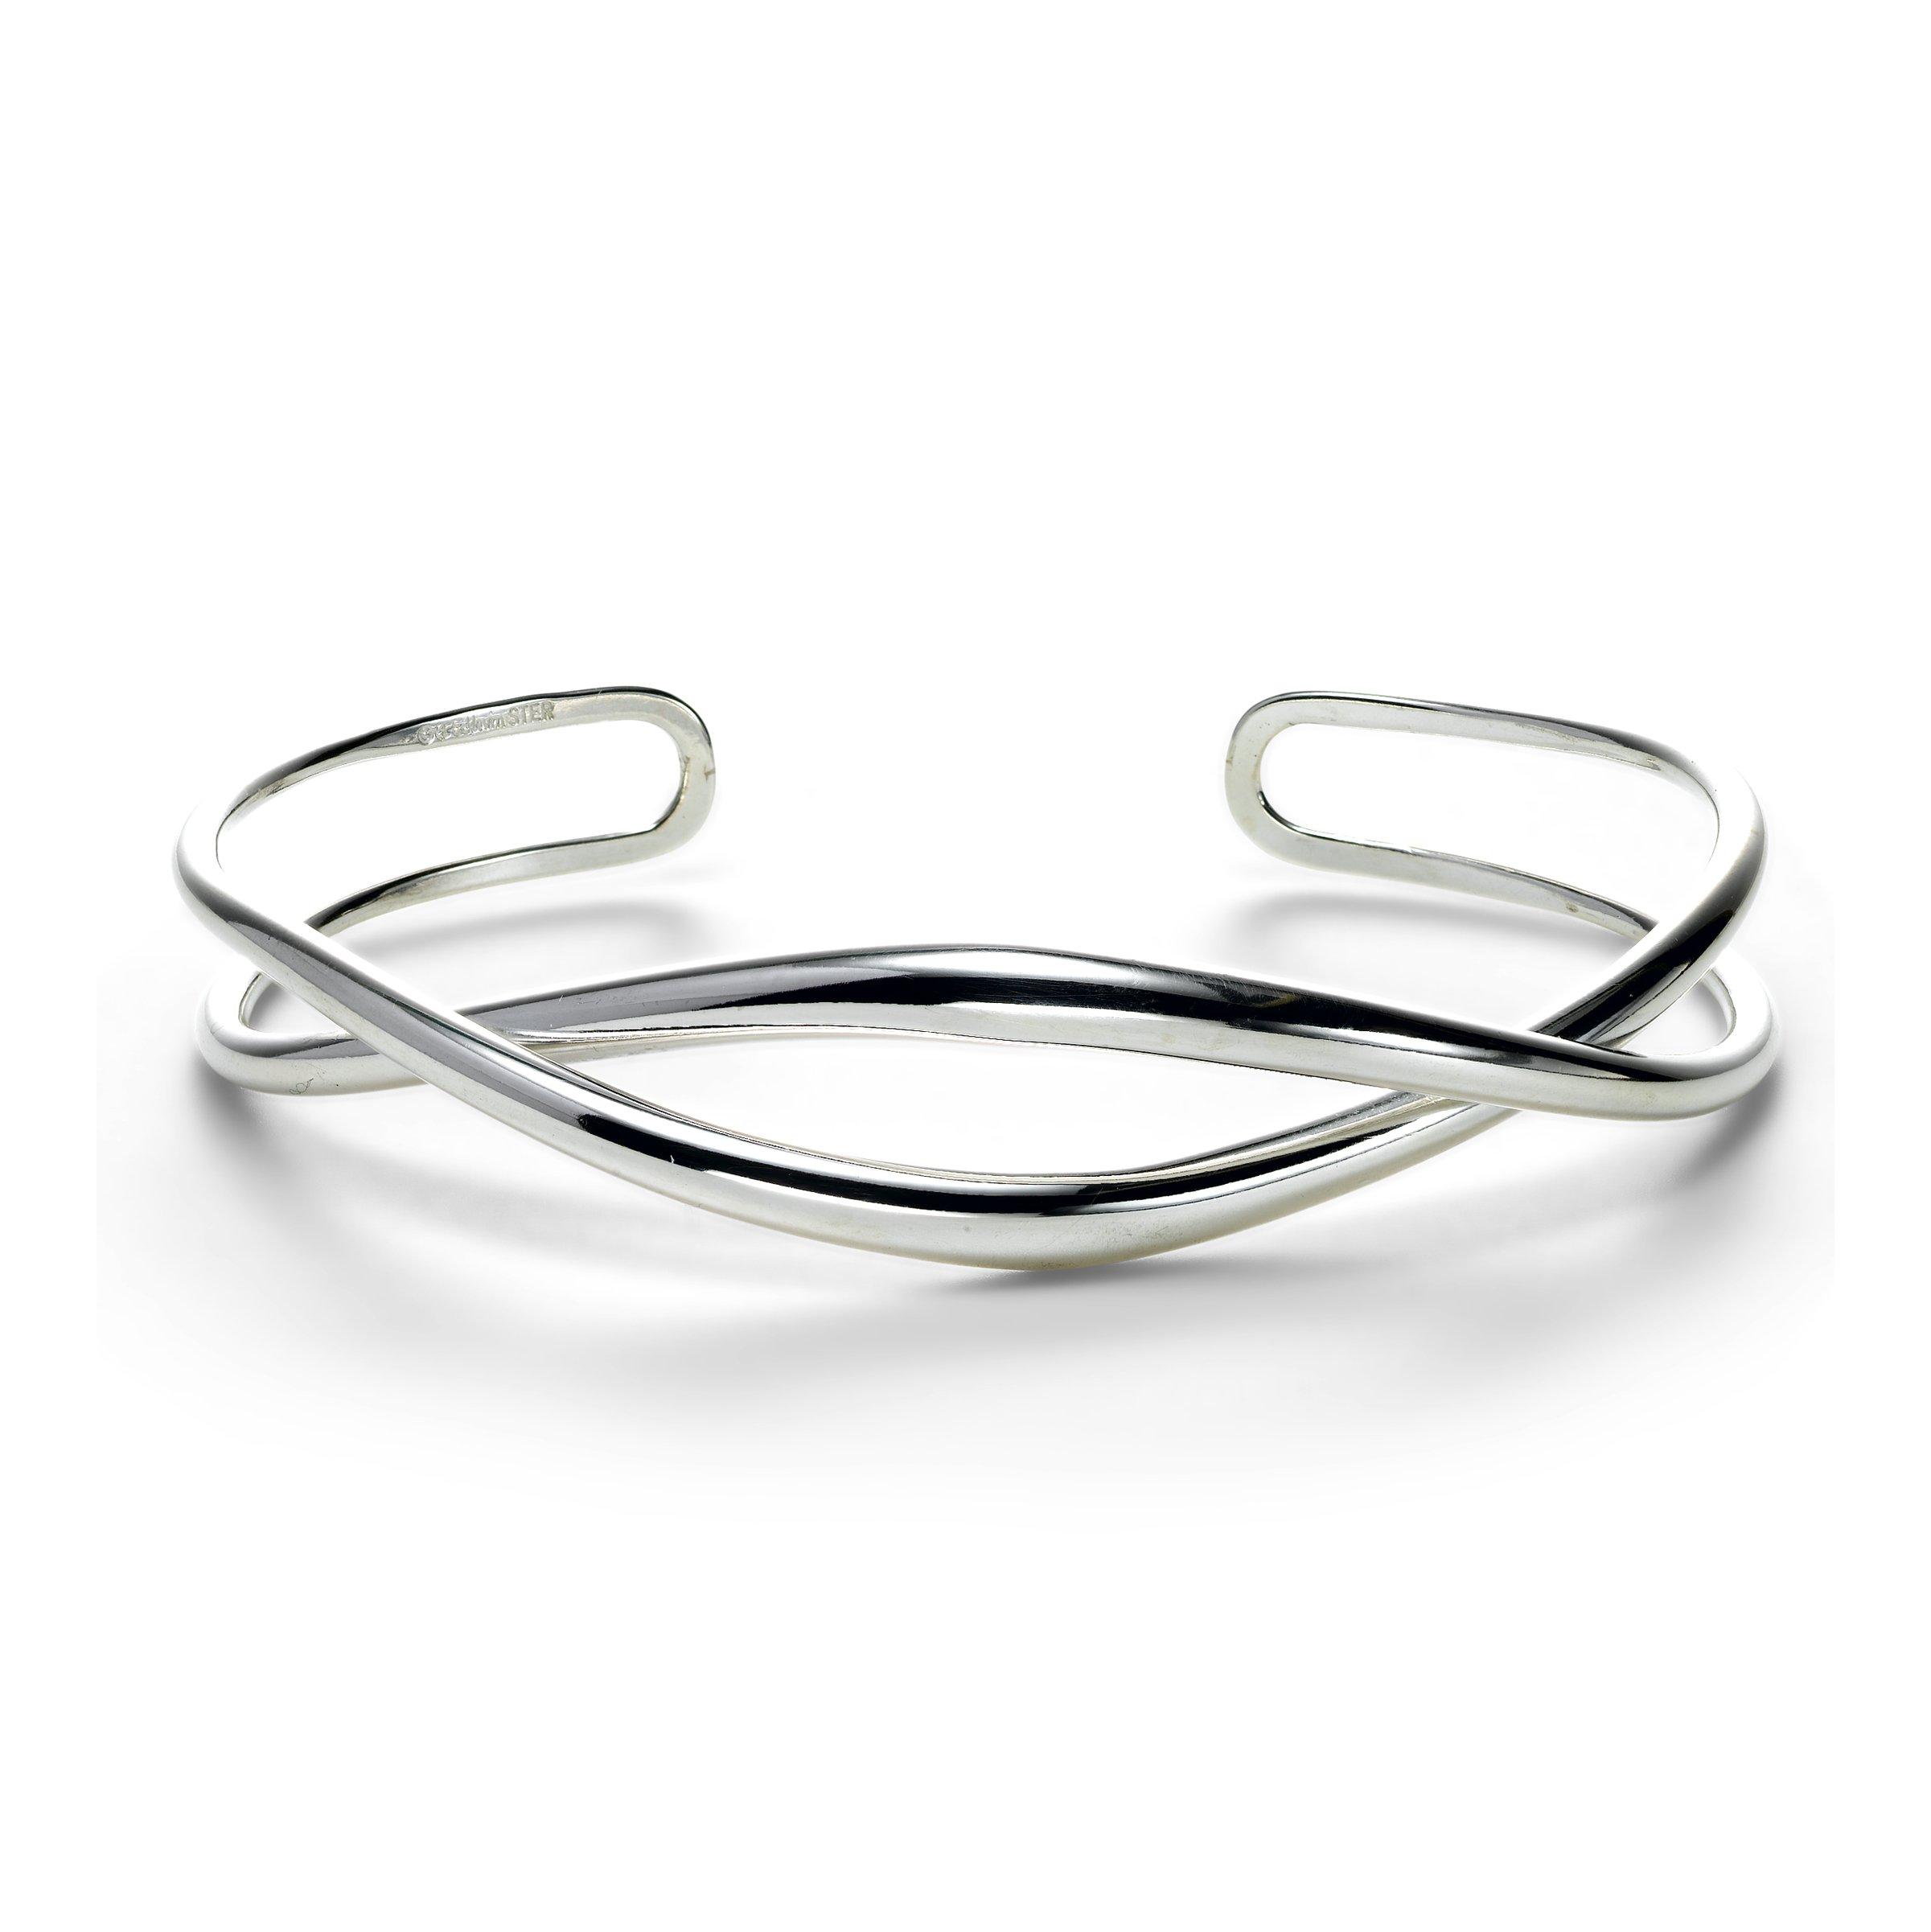 Tendril Cuff Bracelet Sterling Silver, size med-large (6